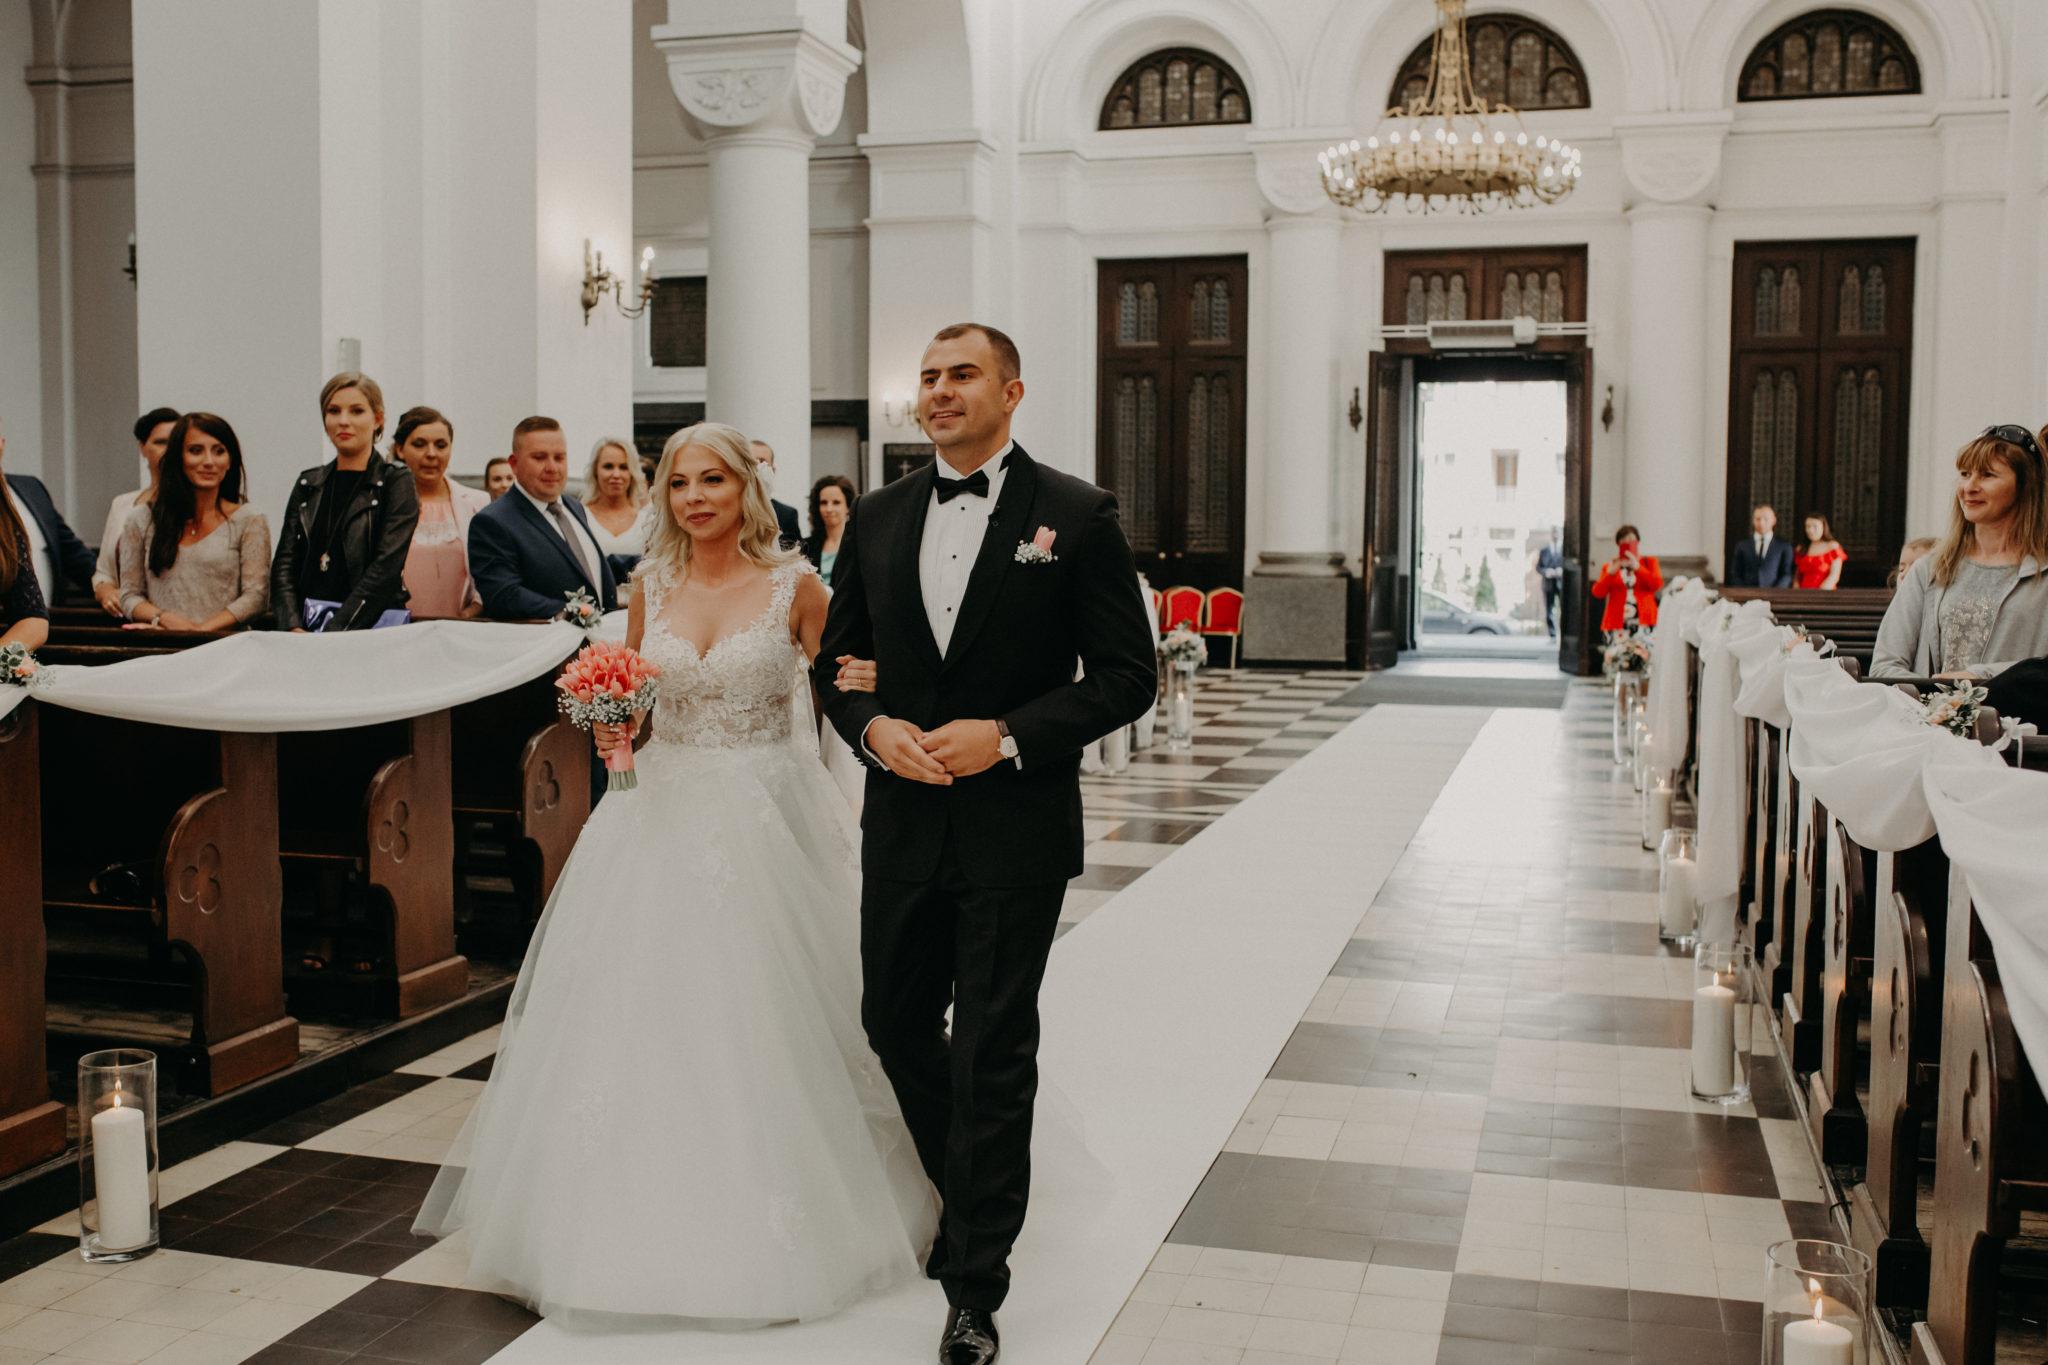 asia i mateusz39 - fotografiaam Fotografia ślubna RK wedding